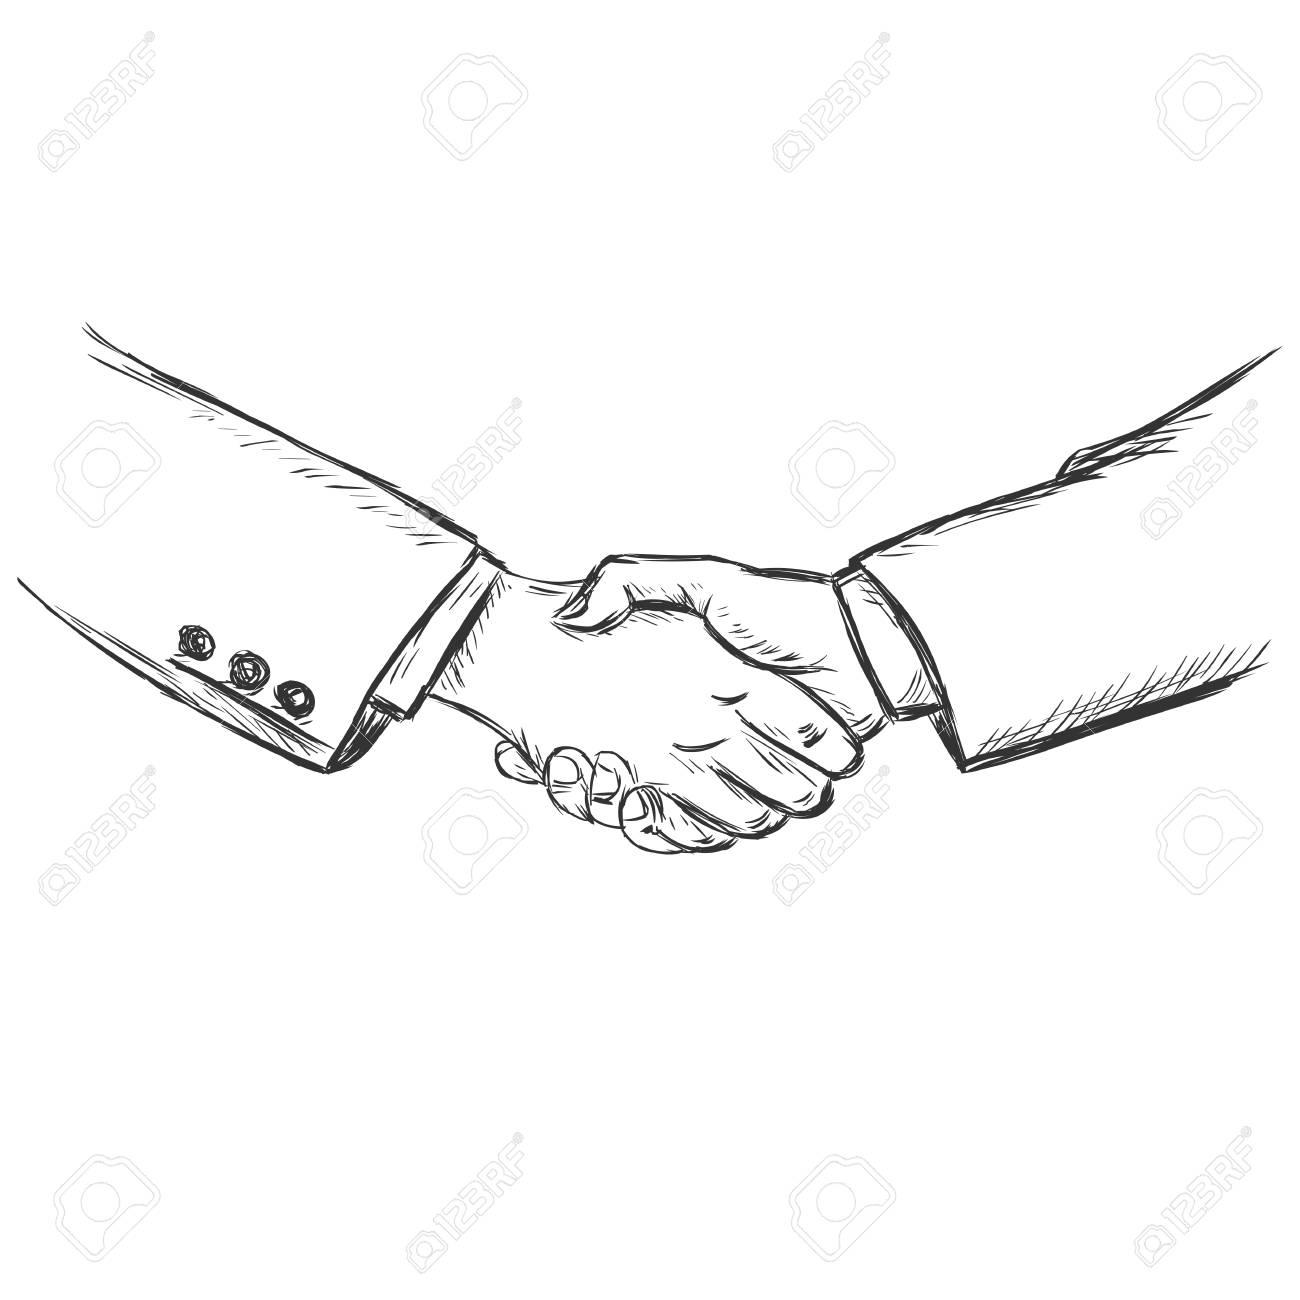 1300x1300 Vector Sketch Illustration Business Handshake Royalty Free